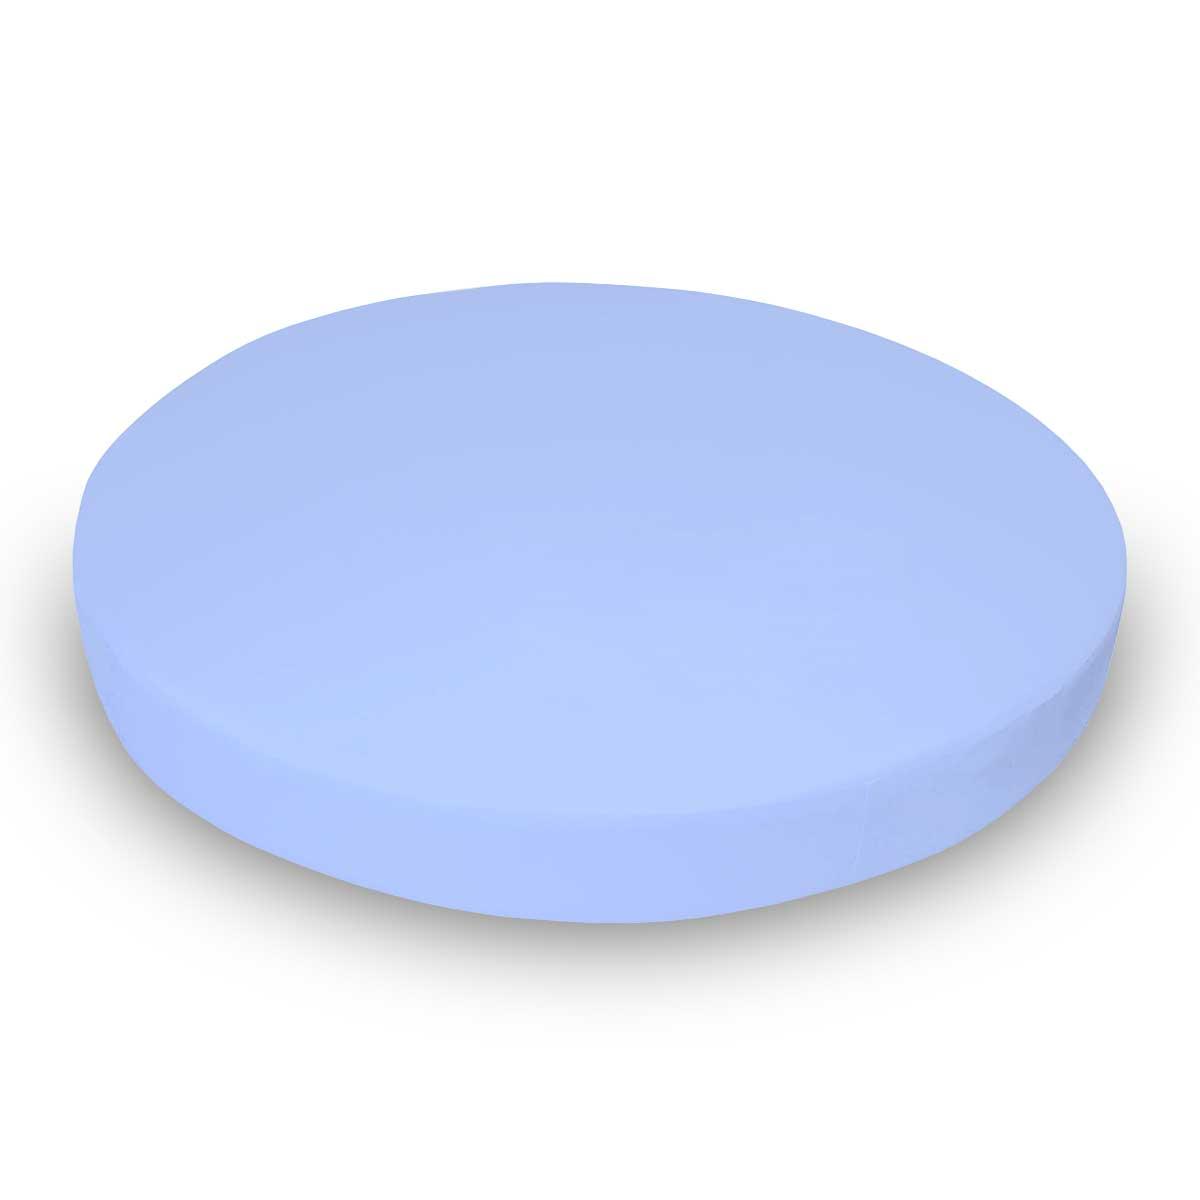 Flannel FS4 - Blue